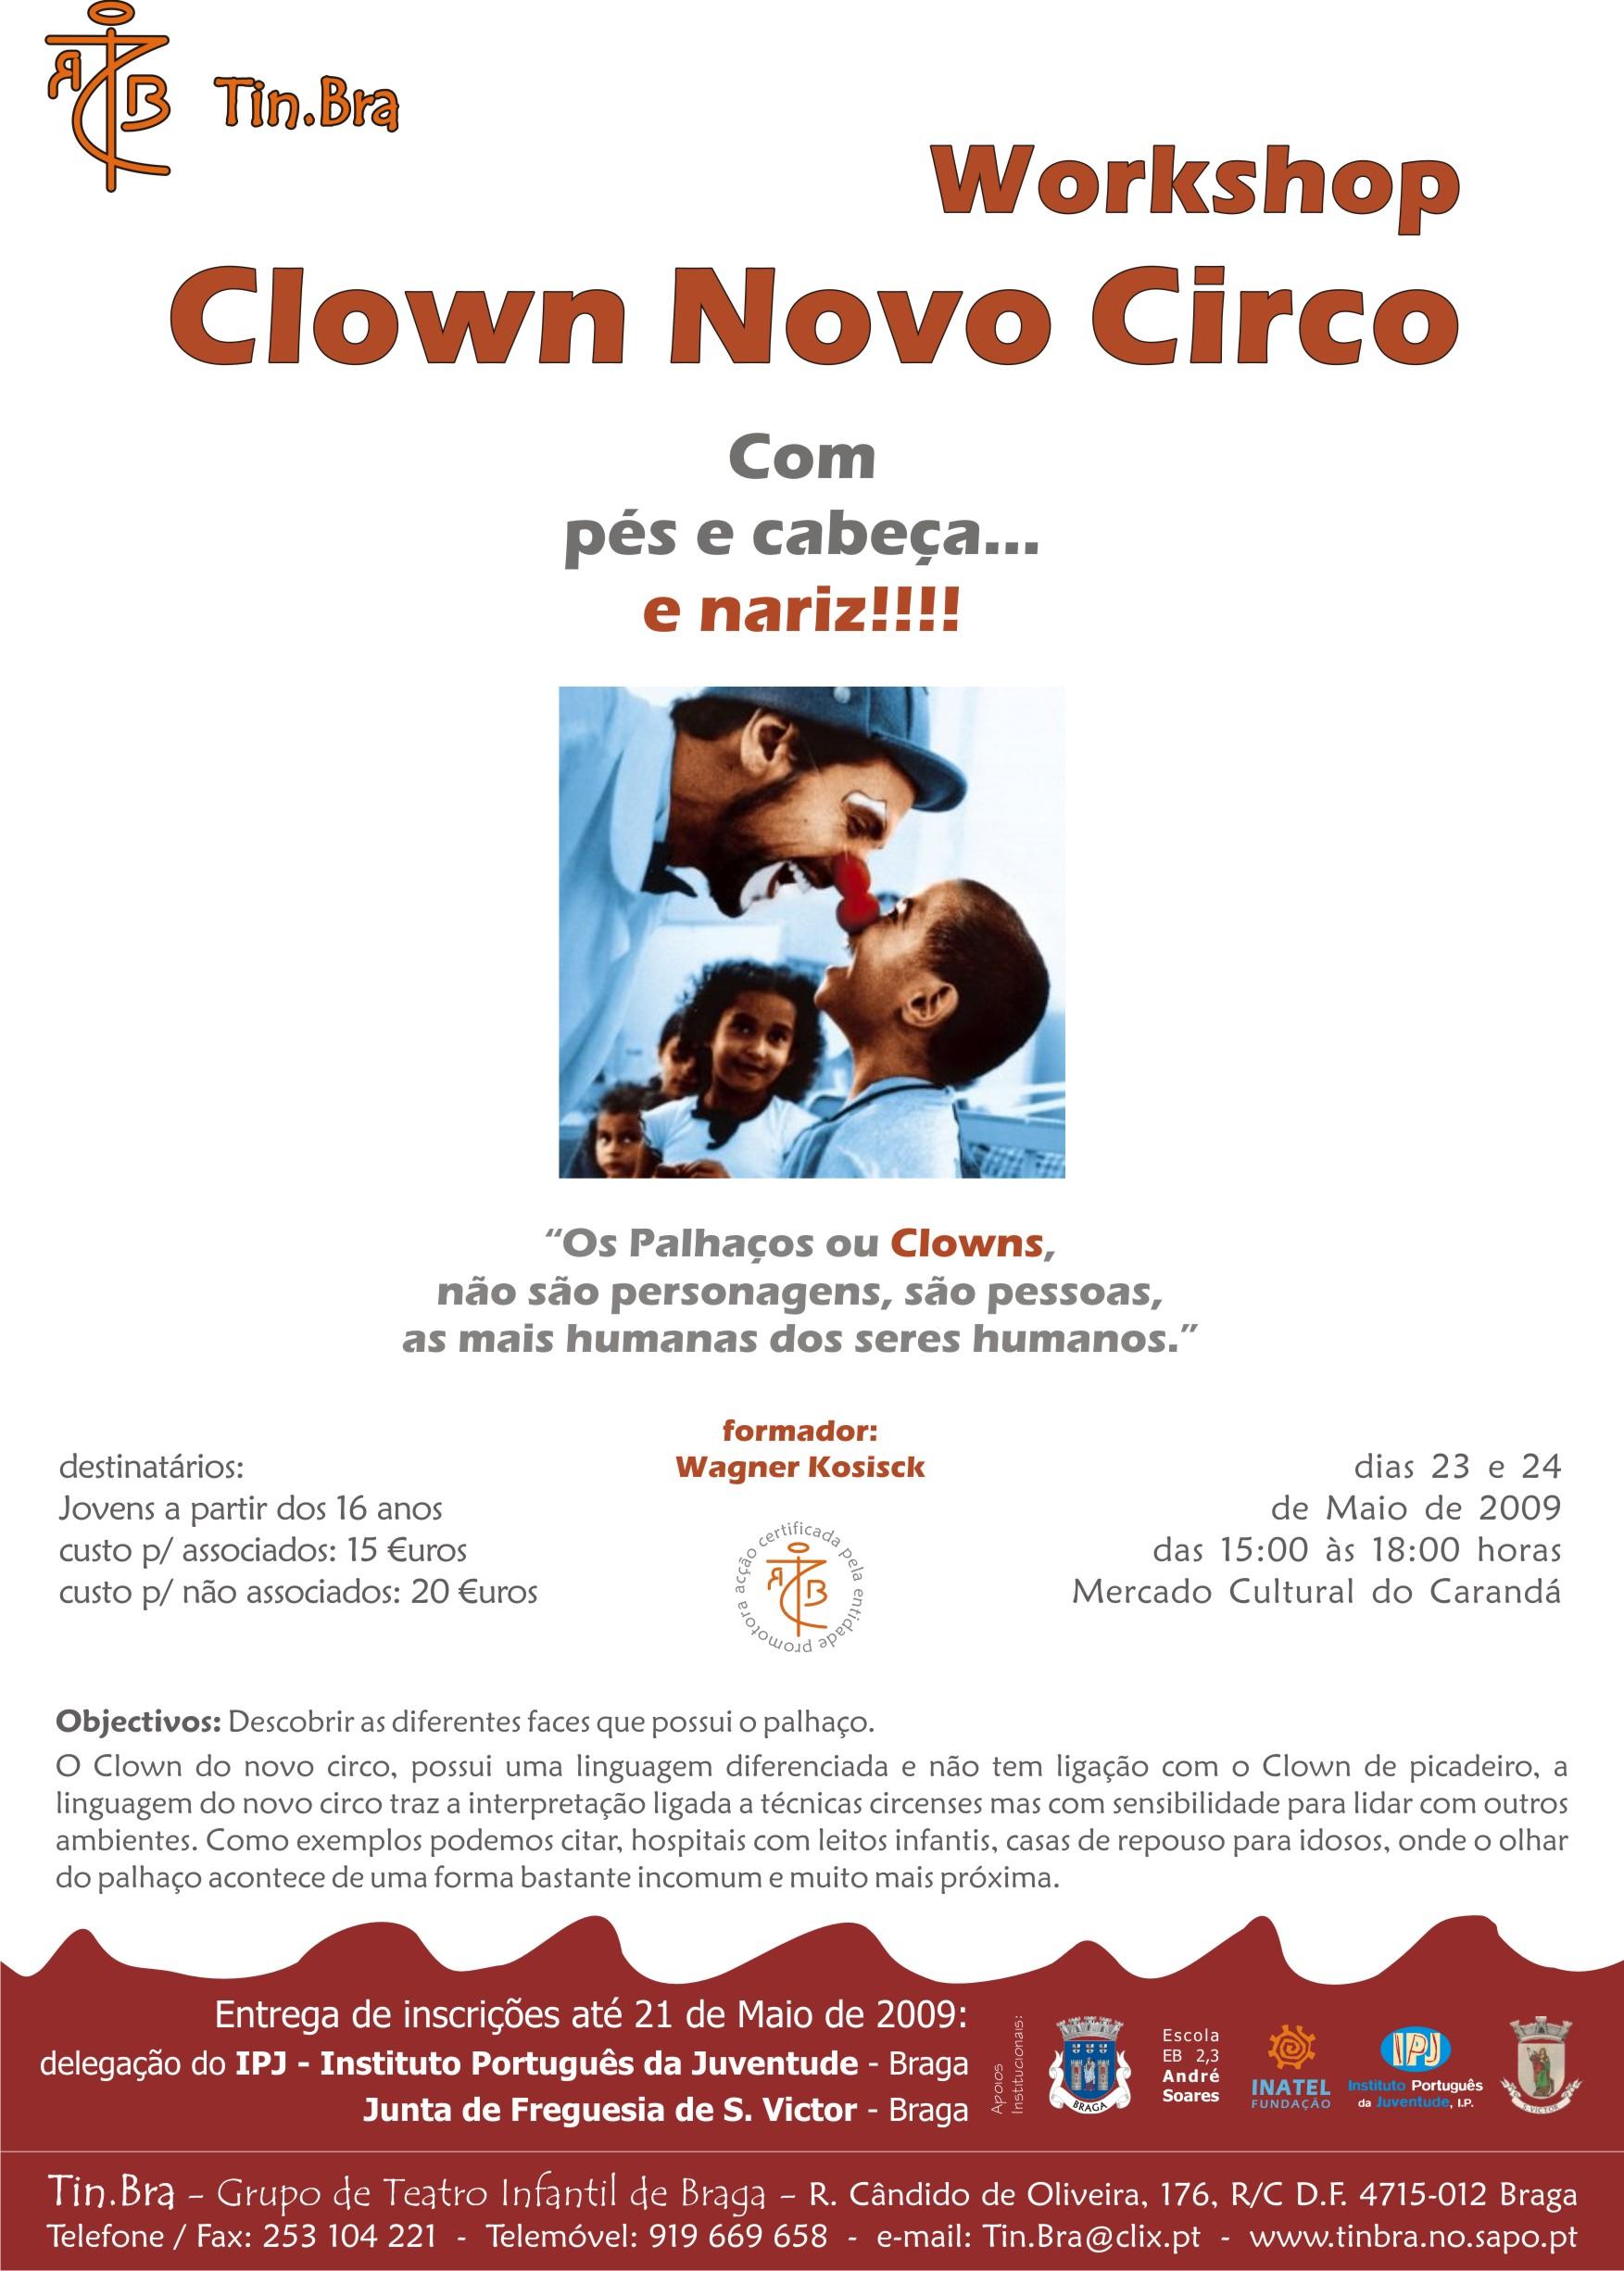 Workshop Clown Novo Circo